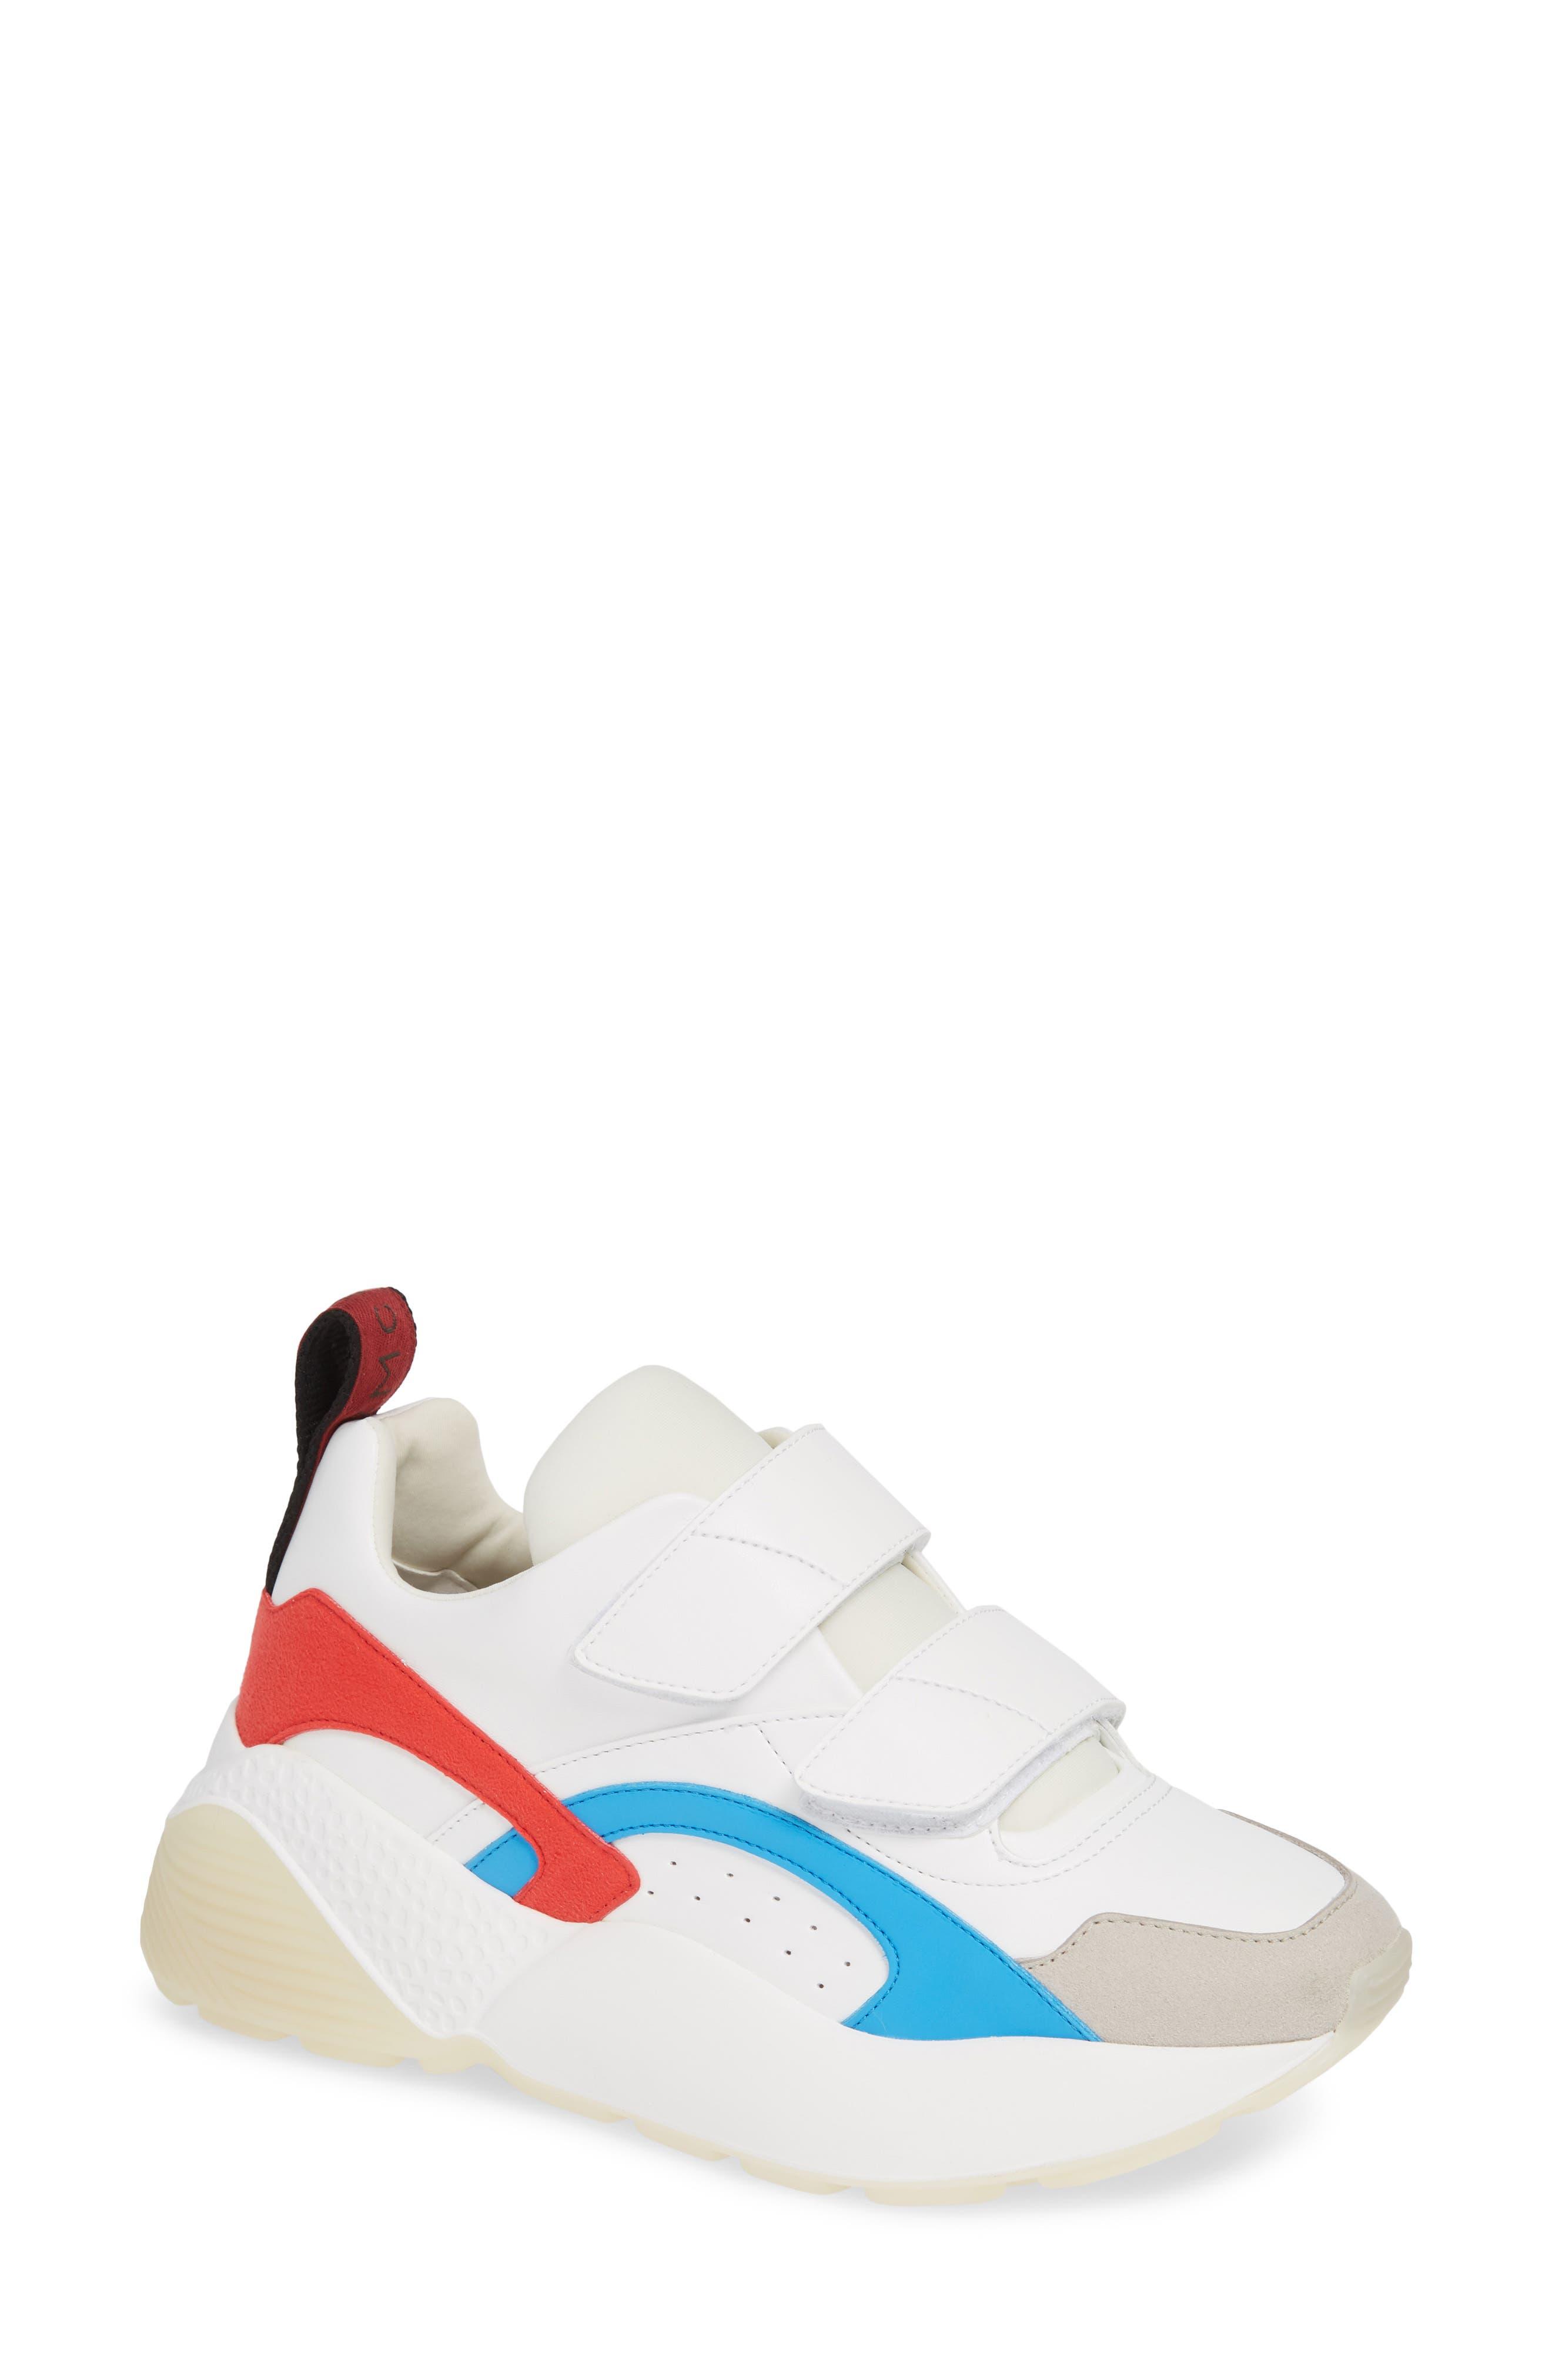 Stella Mccartney Low Top Sneaker, White